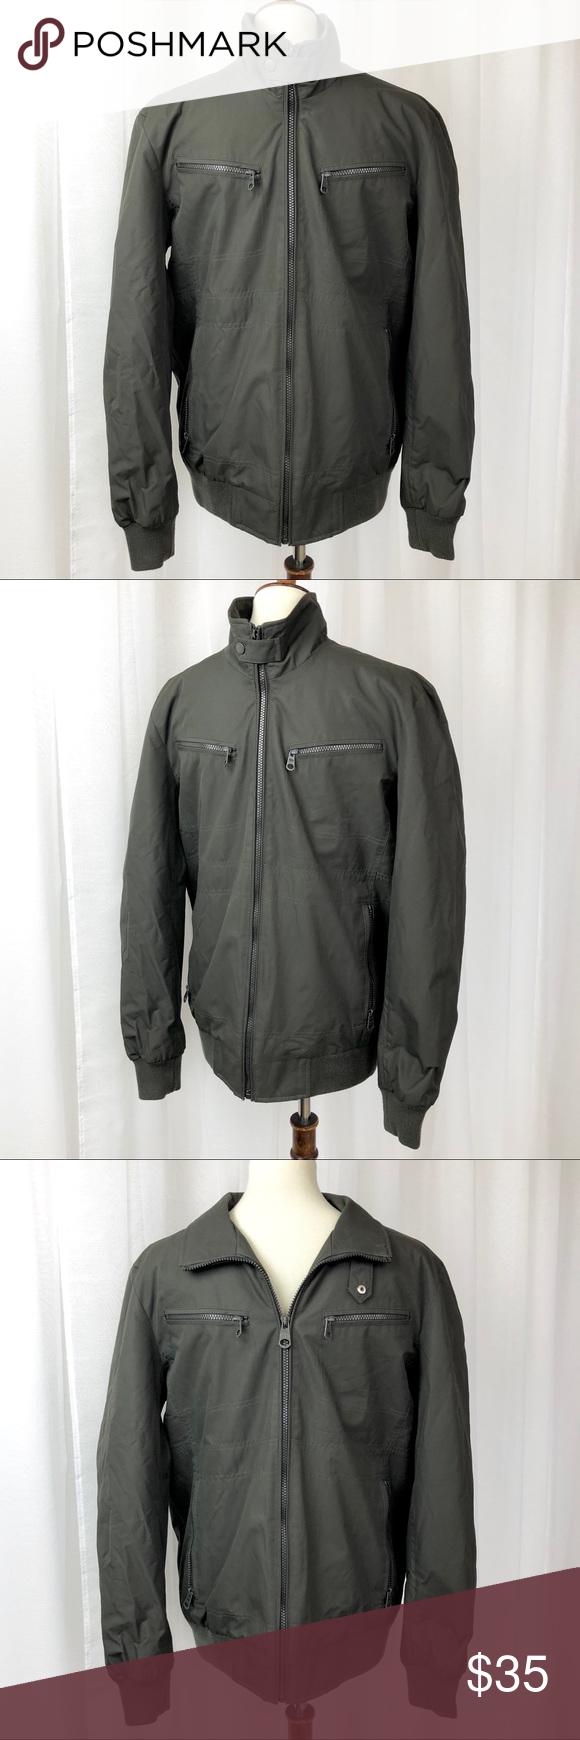 Men S Buffalo David Bitton Outerwear Bomber Jacket Bomber Jacket Clothes Design Jackets [ 1740 x 580 Pixel ]